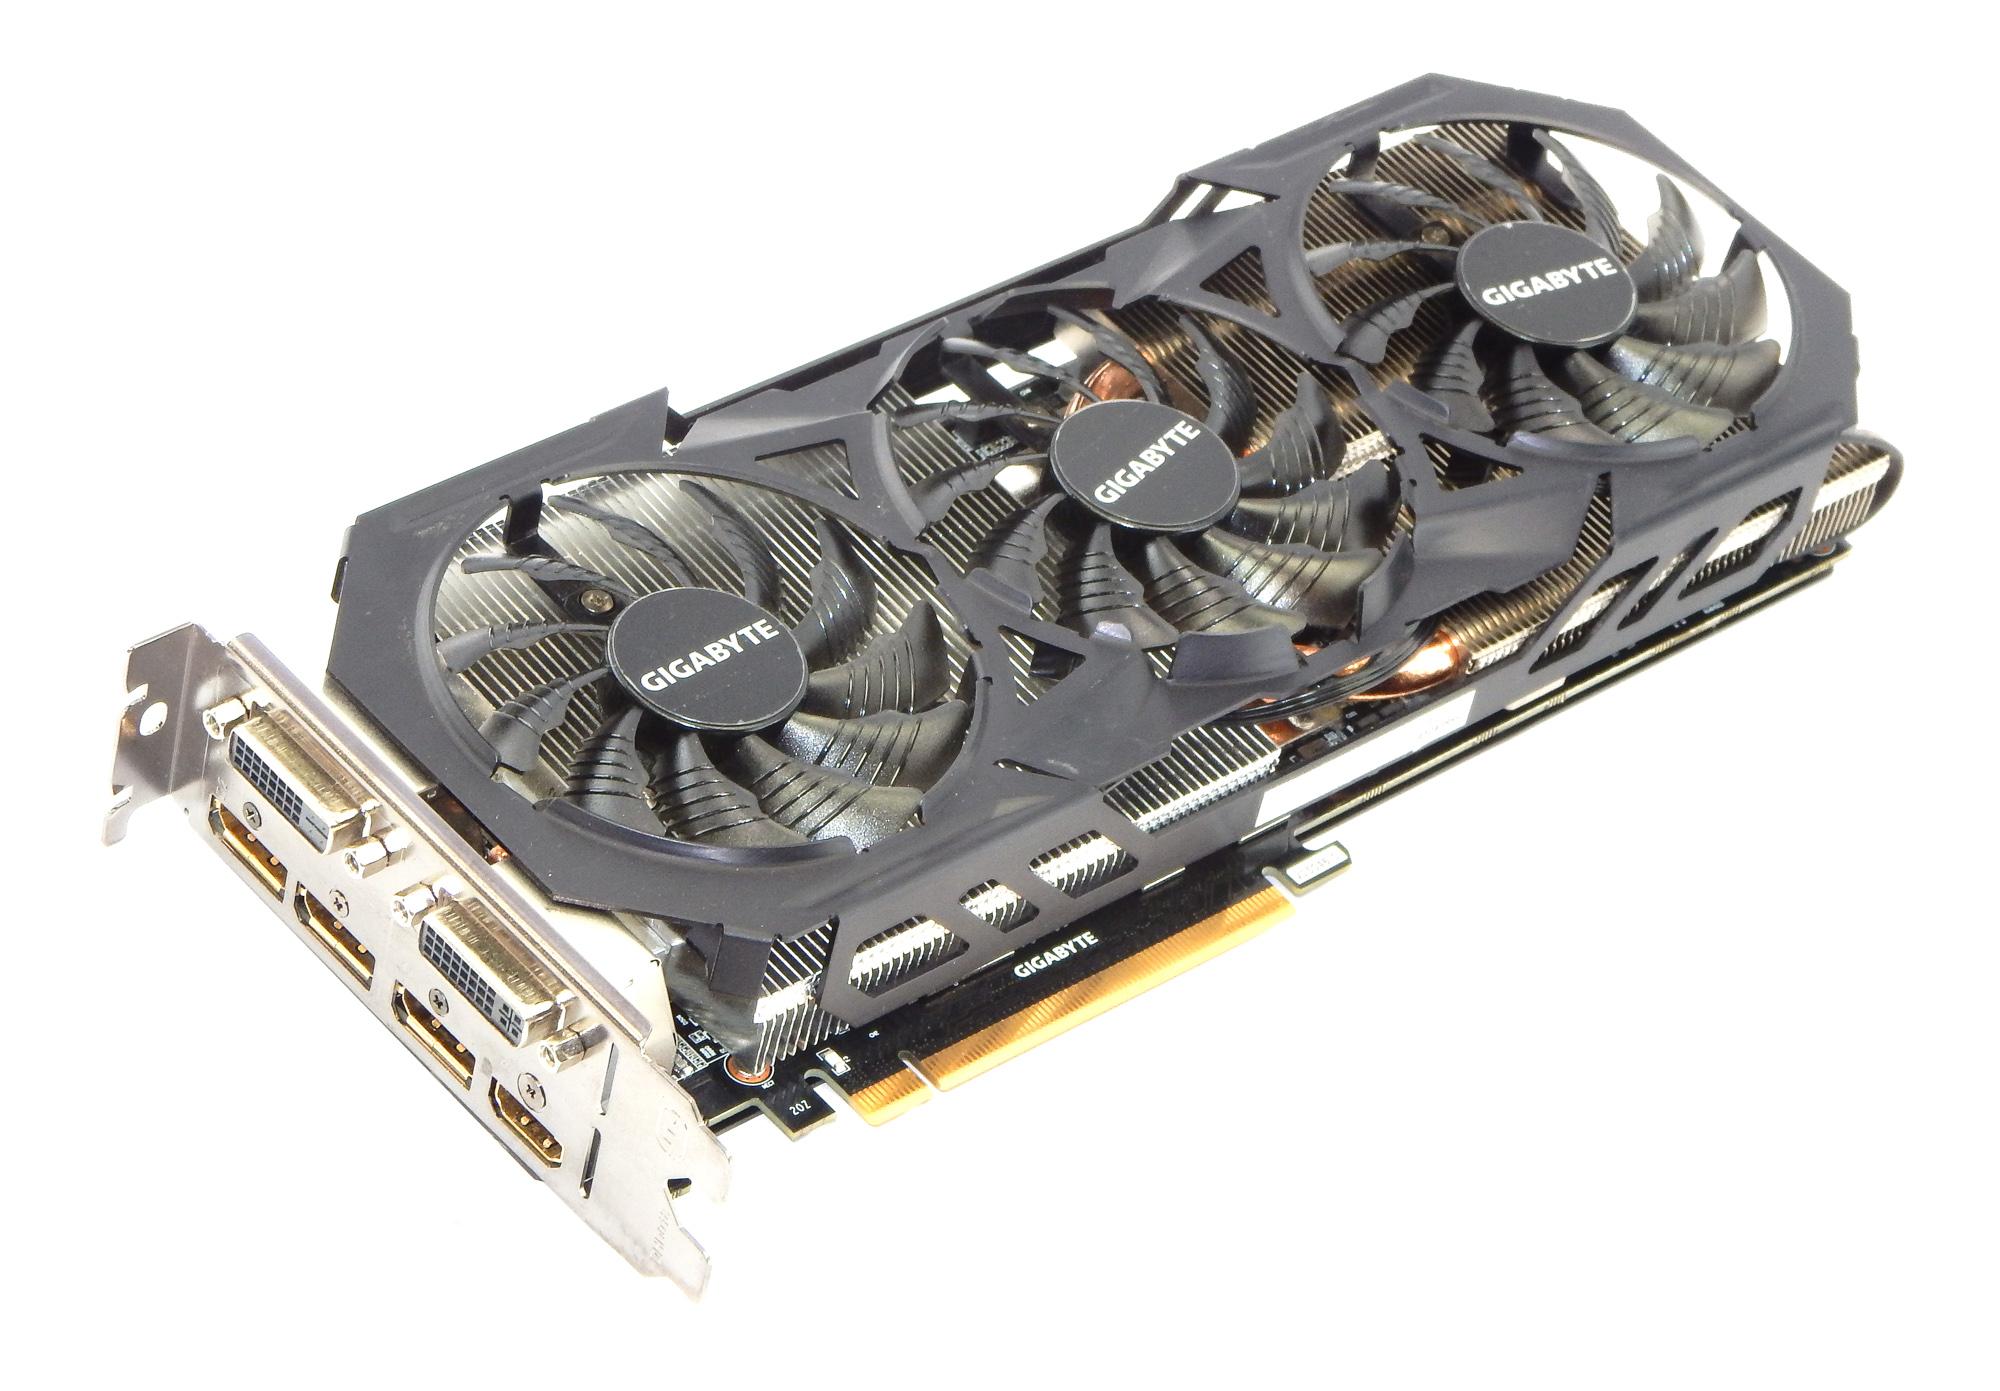 MSI nVidia WindForce 980Ti 6GB DDR5 Gaming Graphics Card <<<Read Descritption>>>